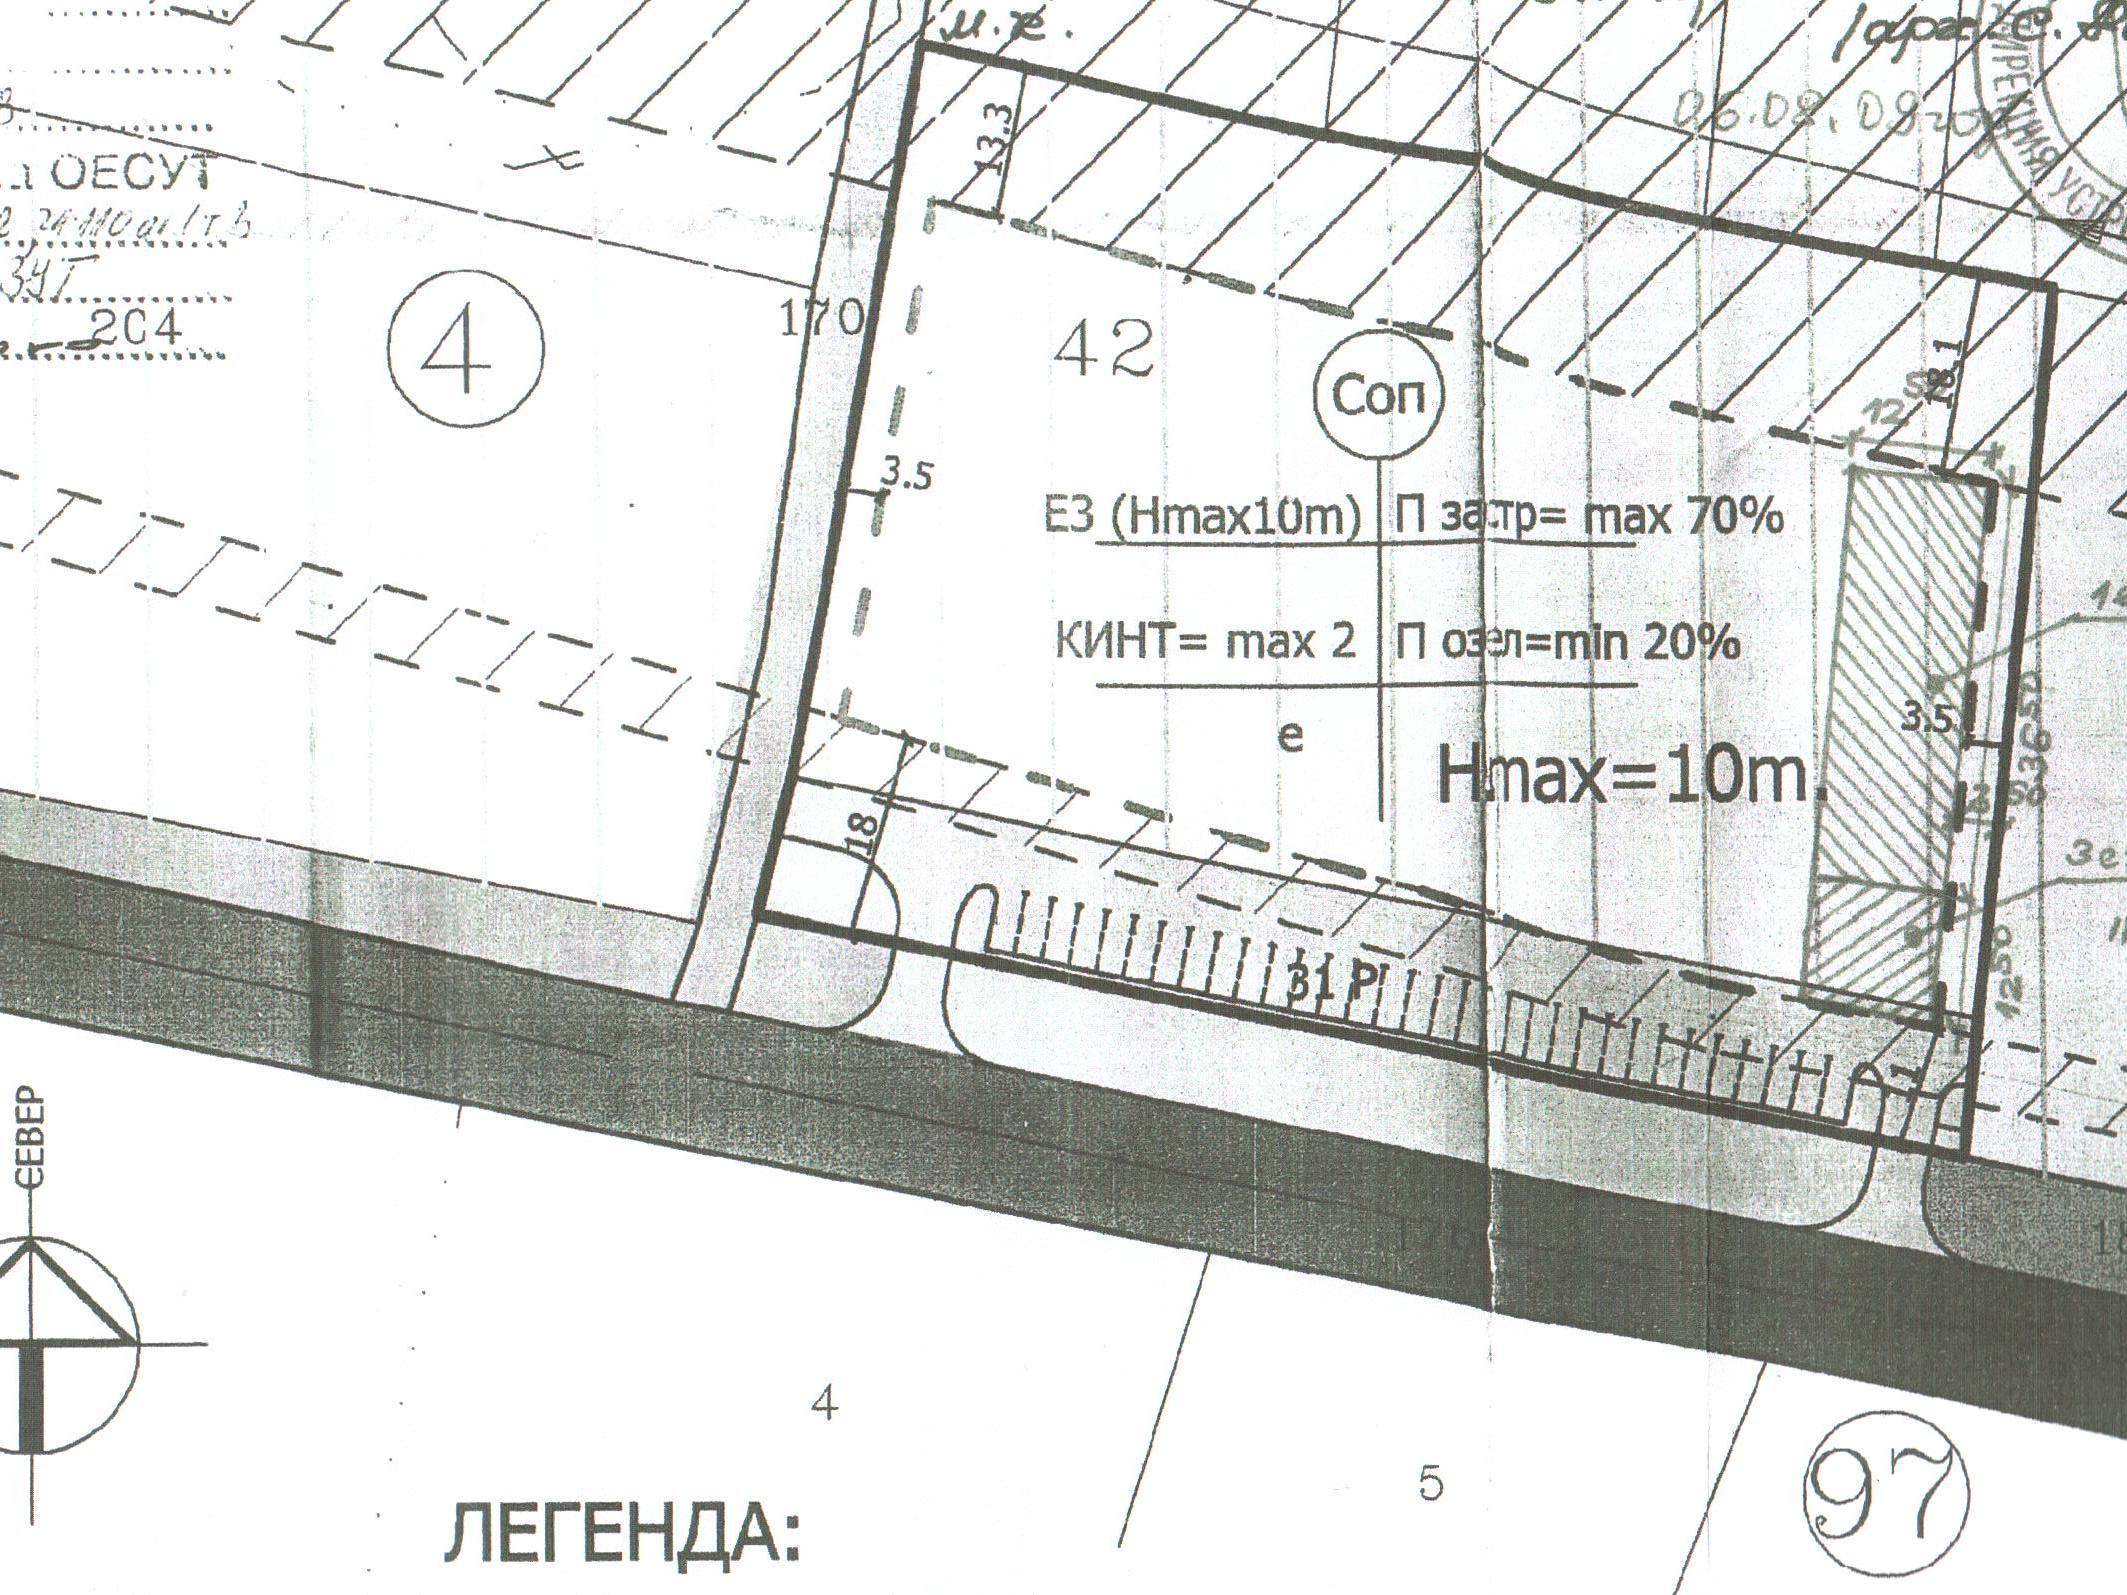 Vendita terreno edificabile ruse ruse bulgaria ruse - Agenzie immobiliari bucarest ...